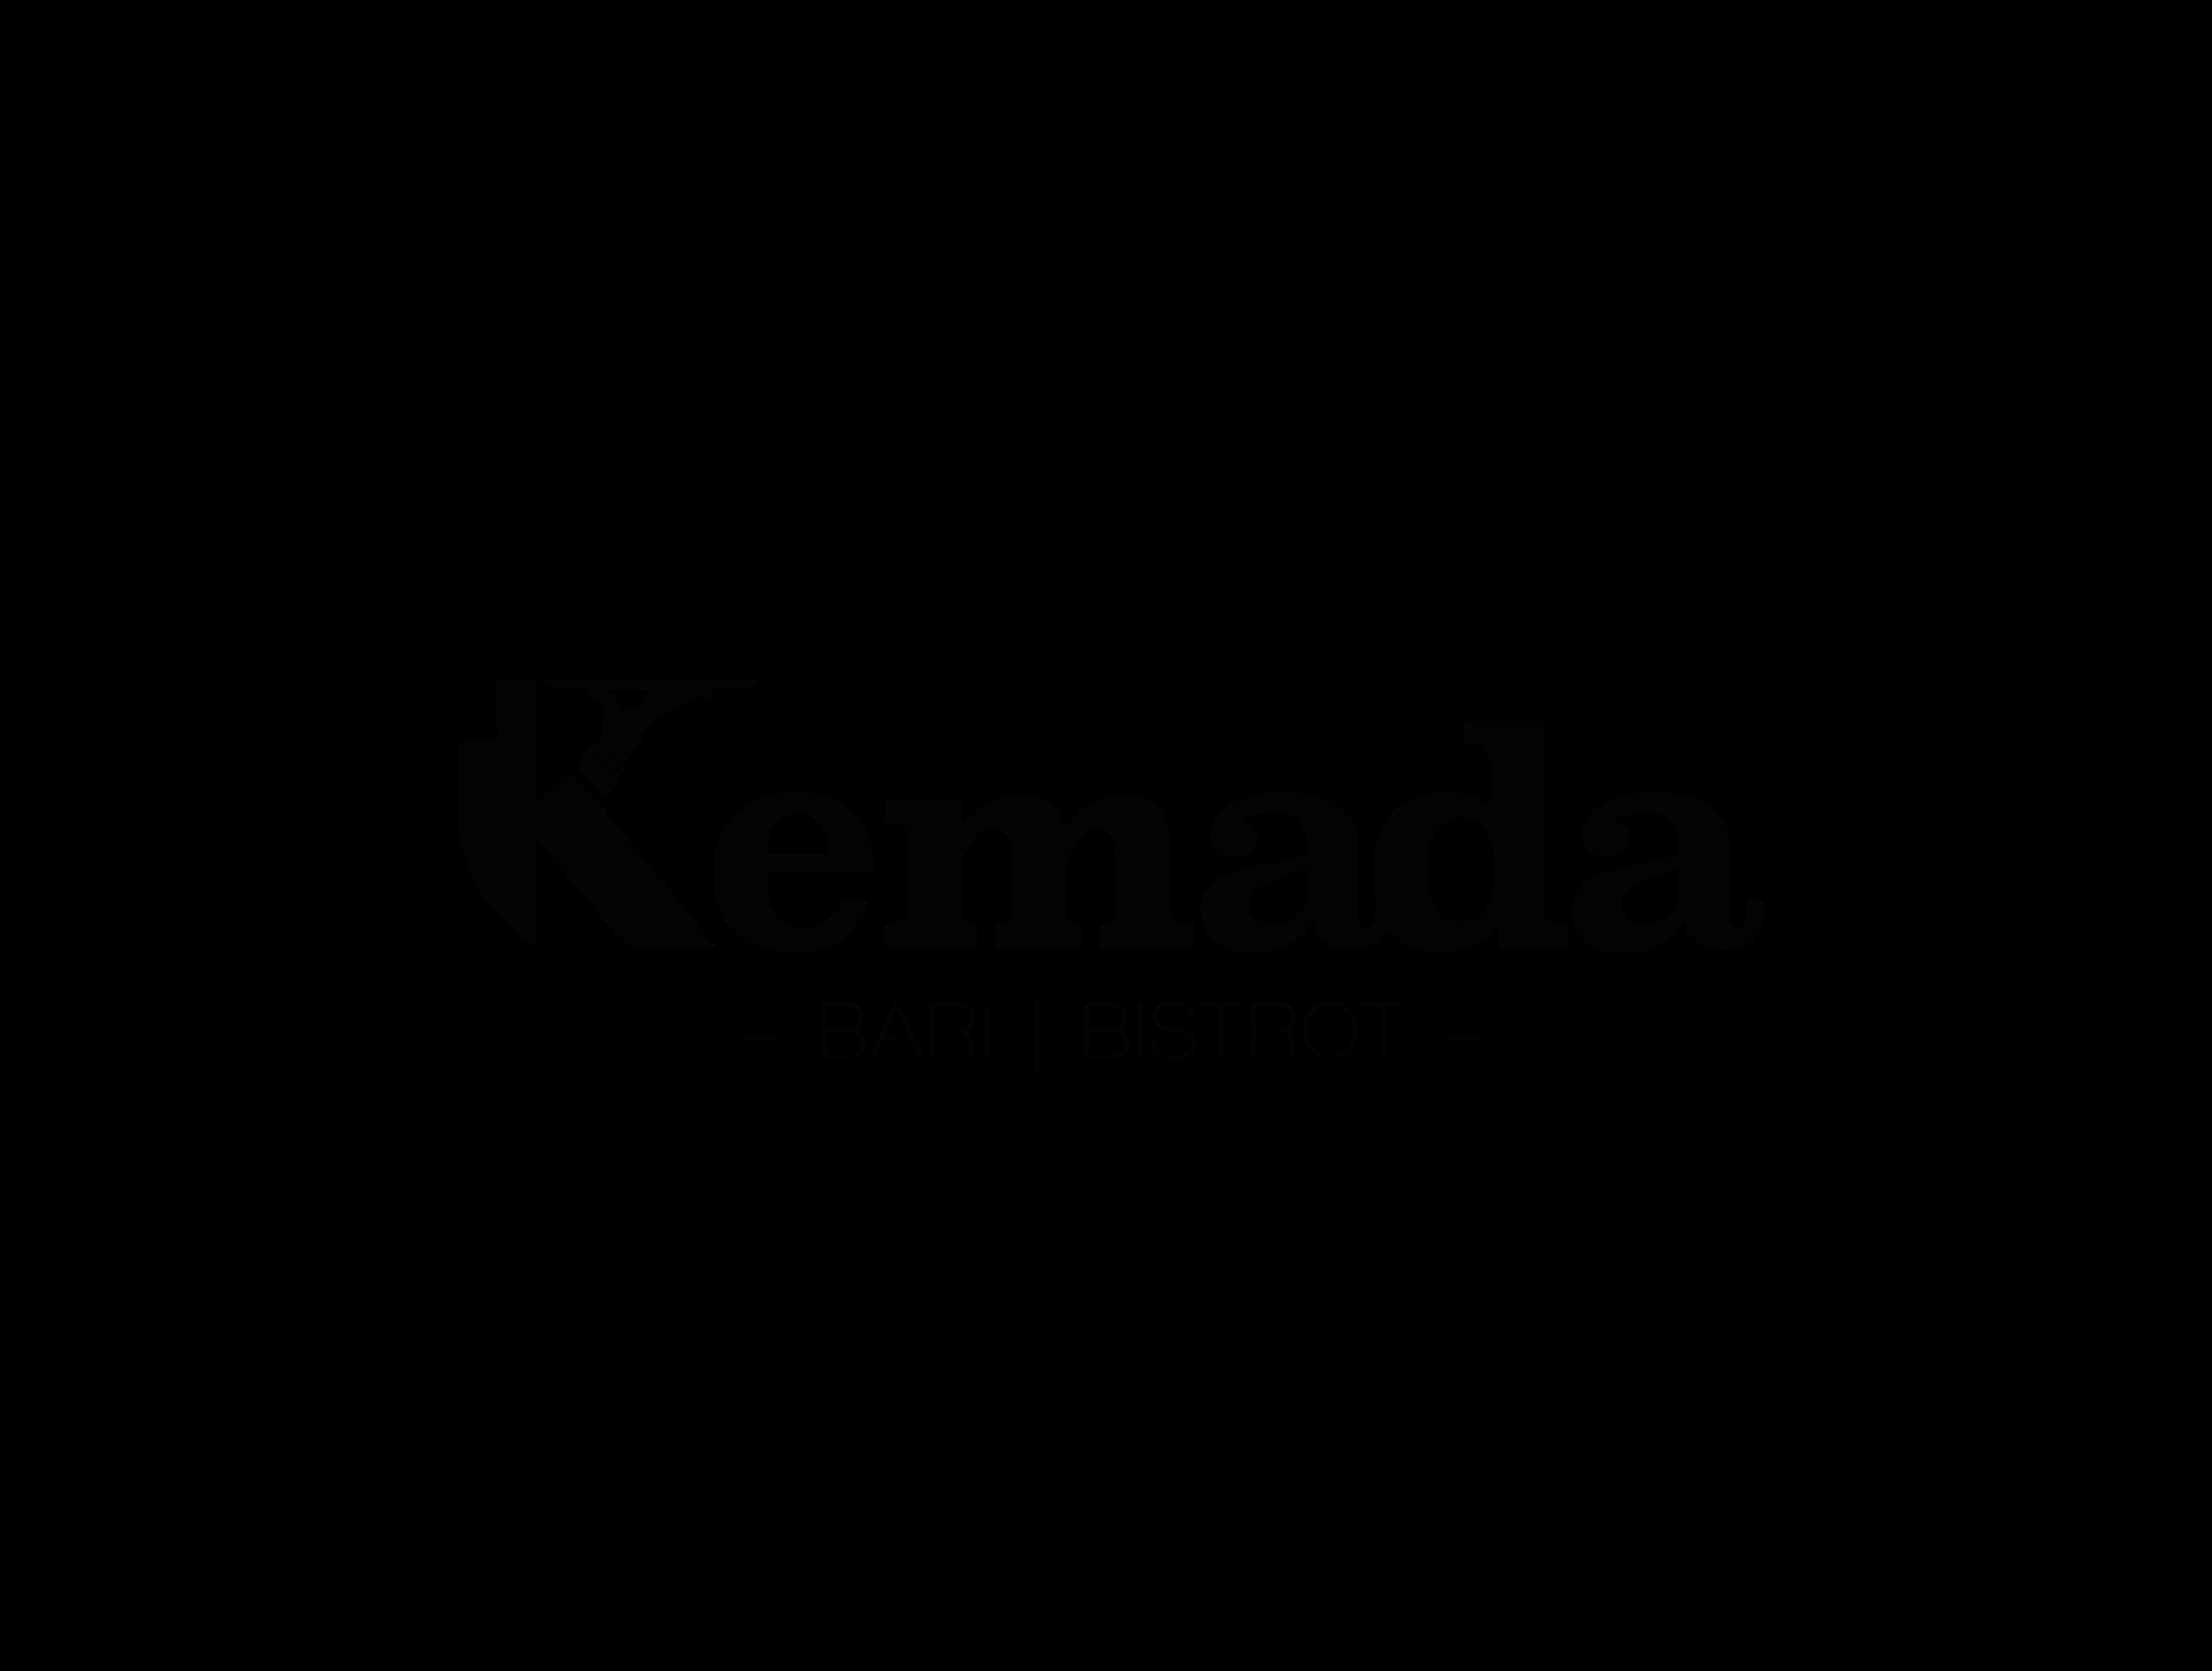 logo kemada